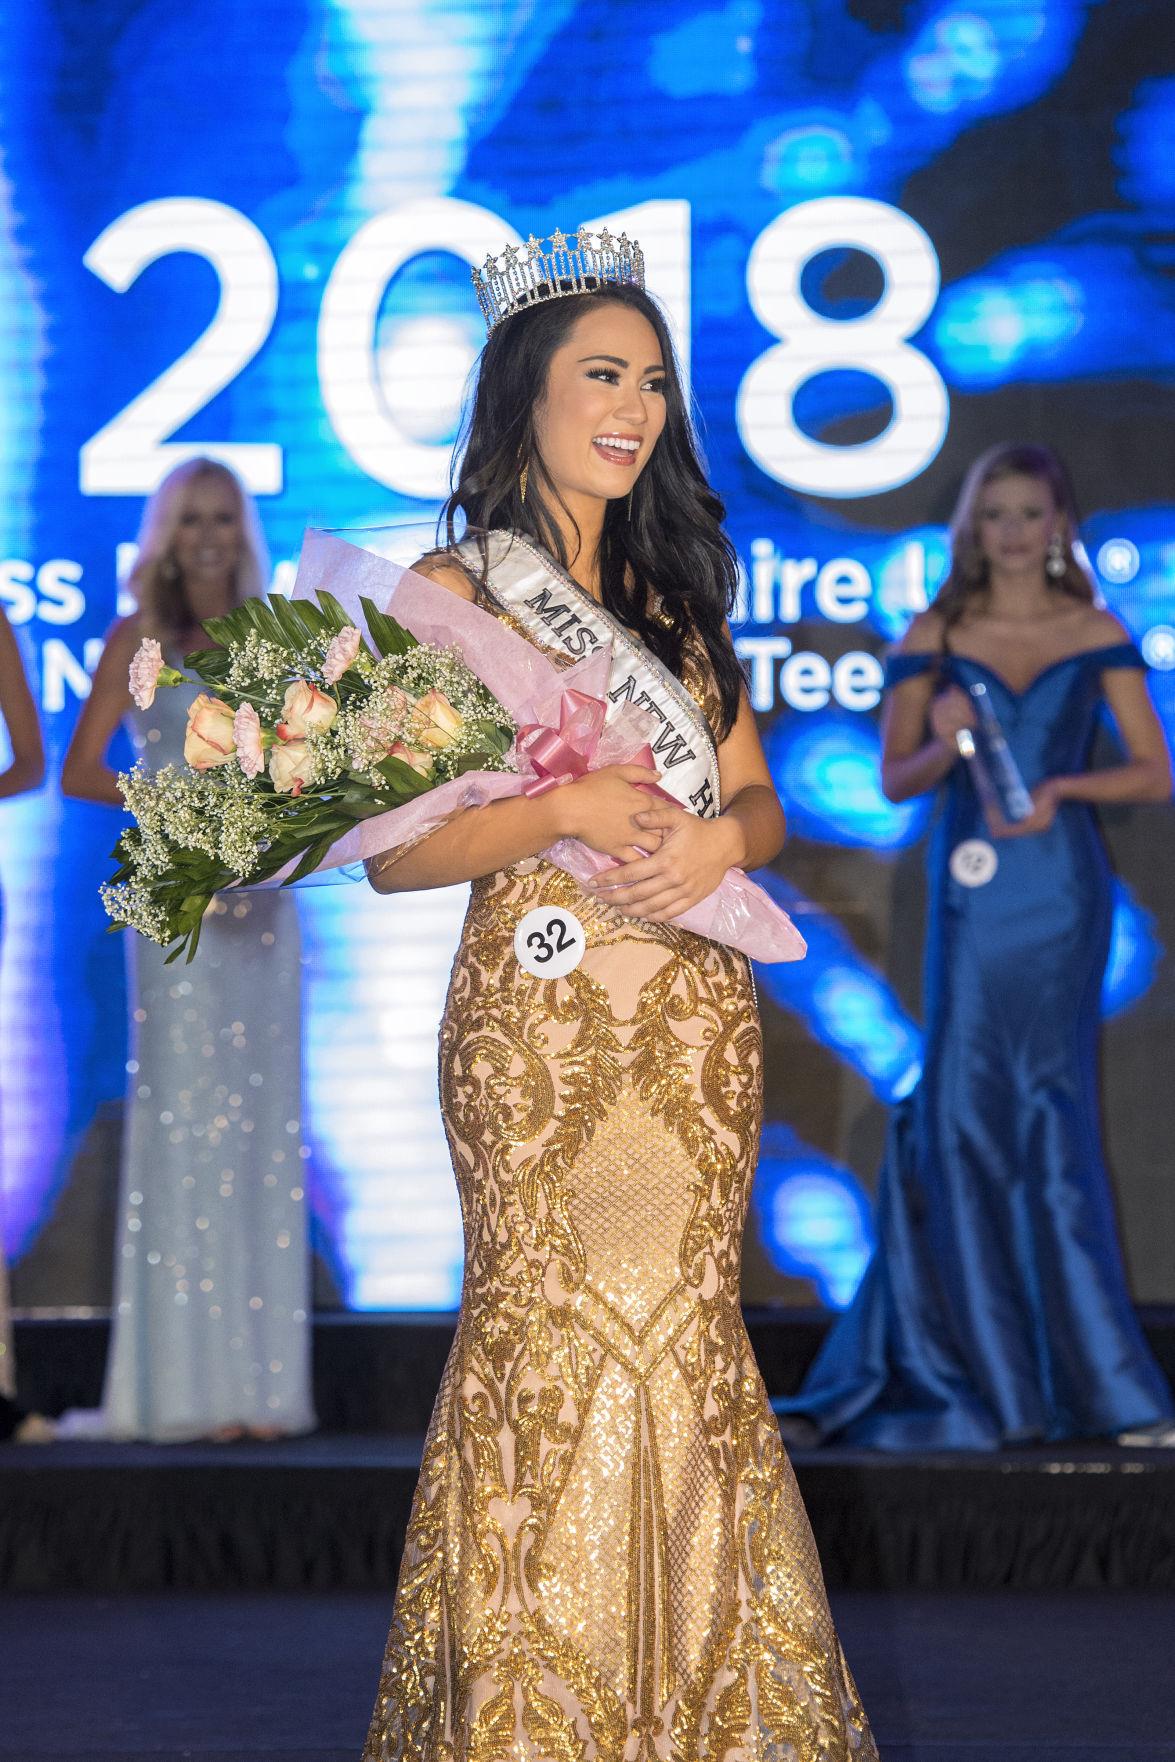 Miss NH USA 2018